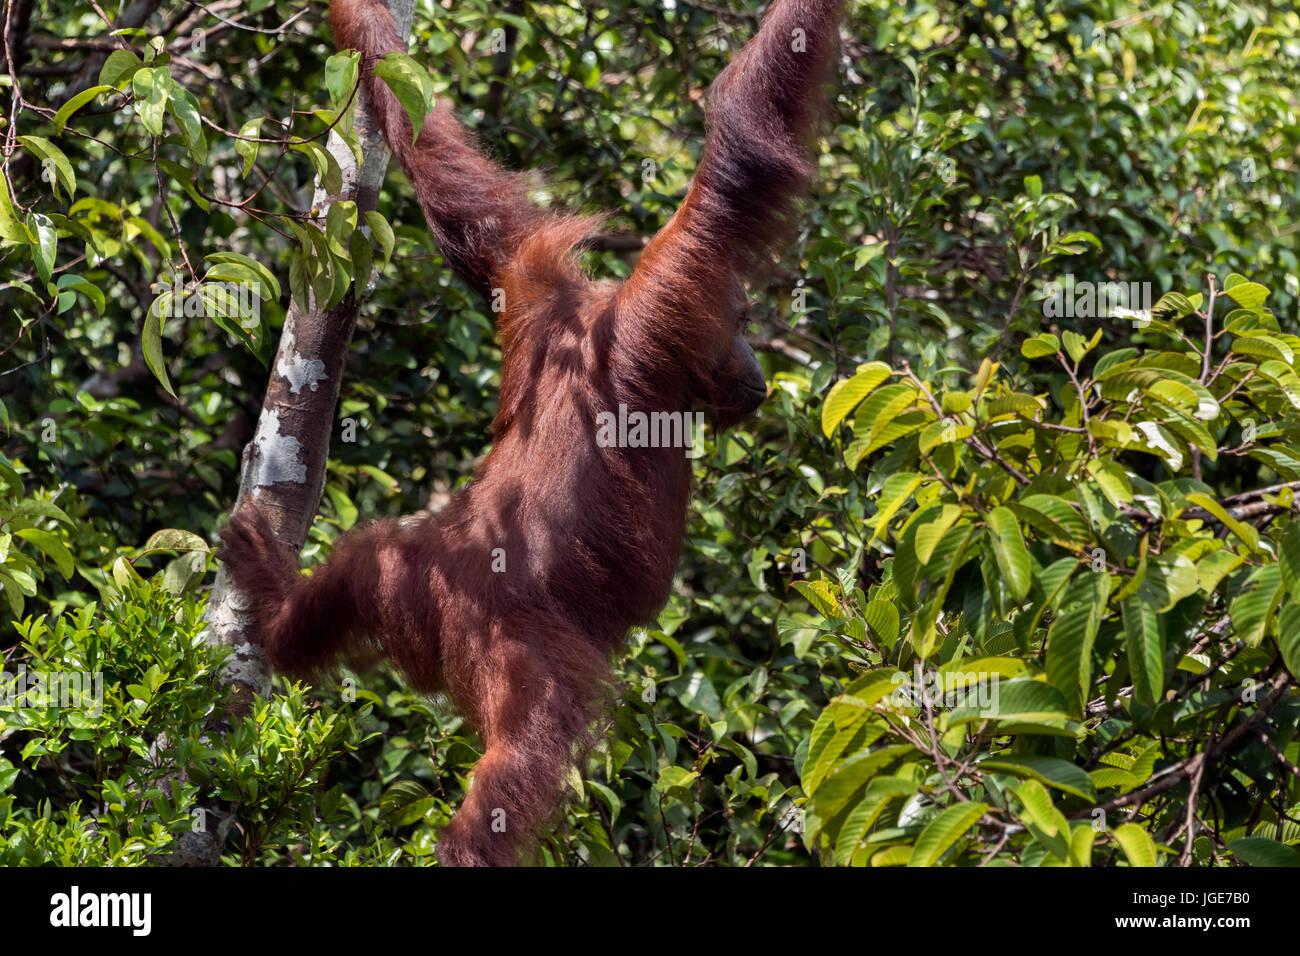 Wild orangutan swinging through the trees, Tanjung Puting National Park, Kalimantan, Indonesia - Stock Image